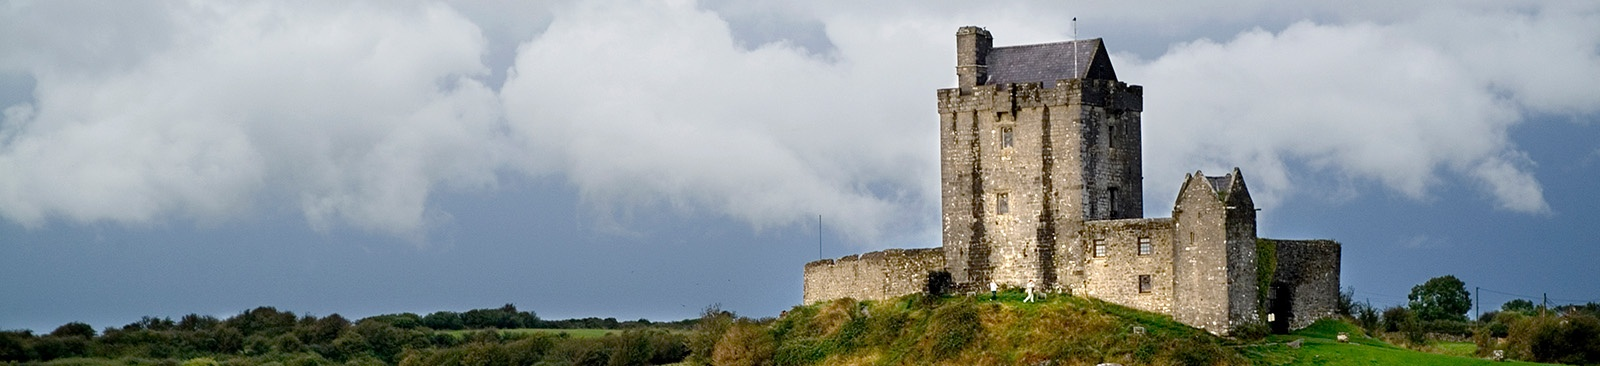 Castle on a grassy knoll